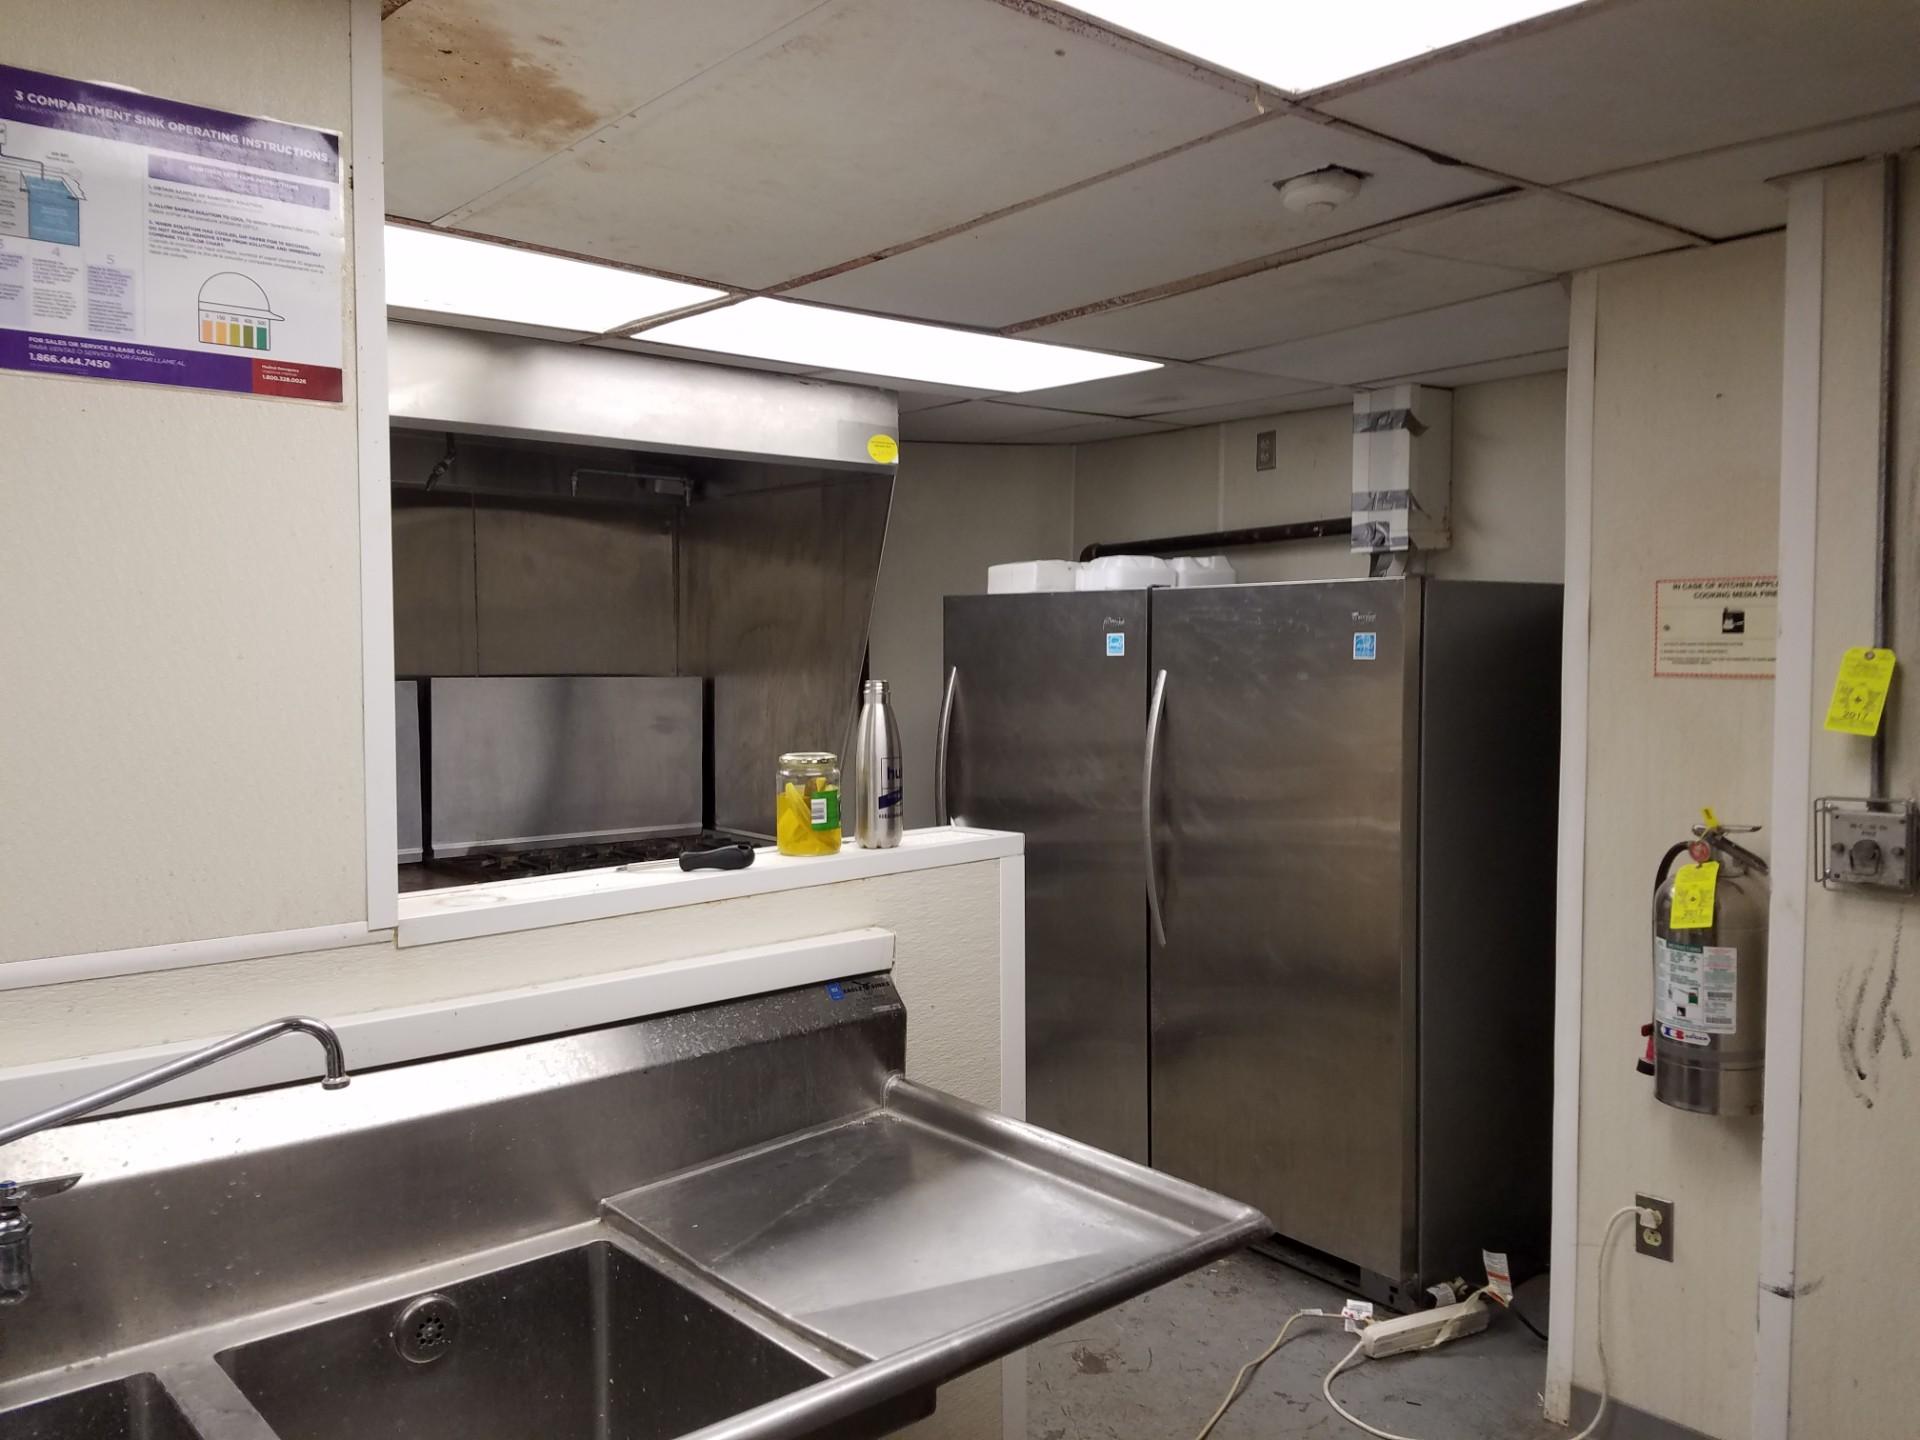 2017-2018_Kitchen_Renovation_1920_20171221_072526_pre-construction.jpg